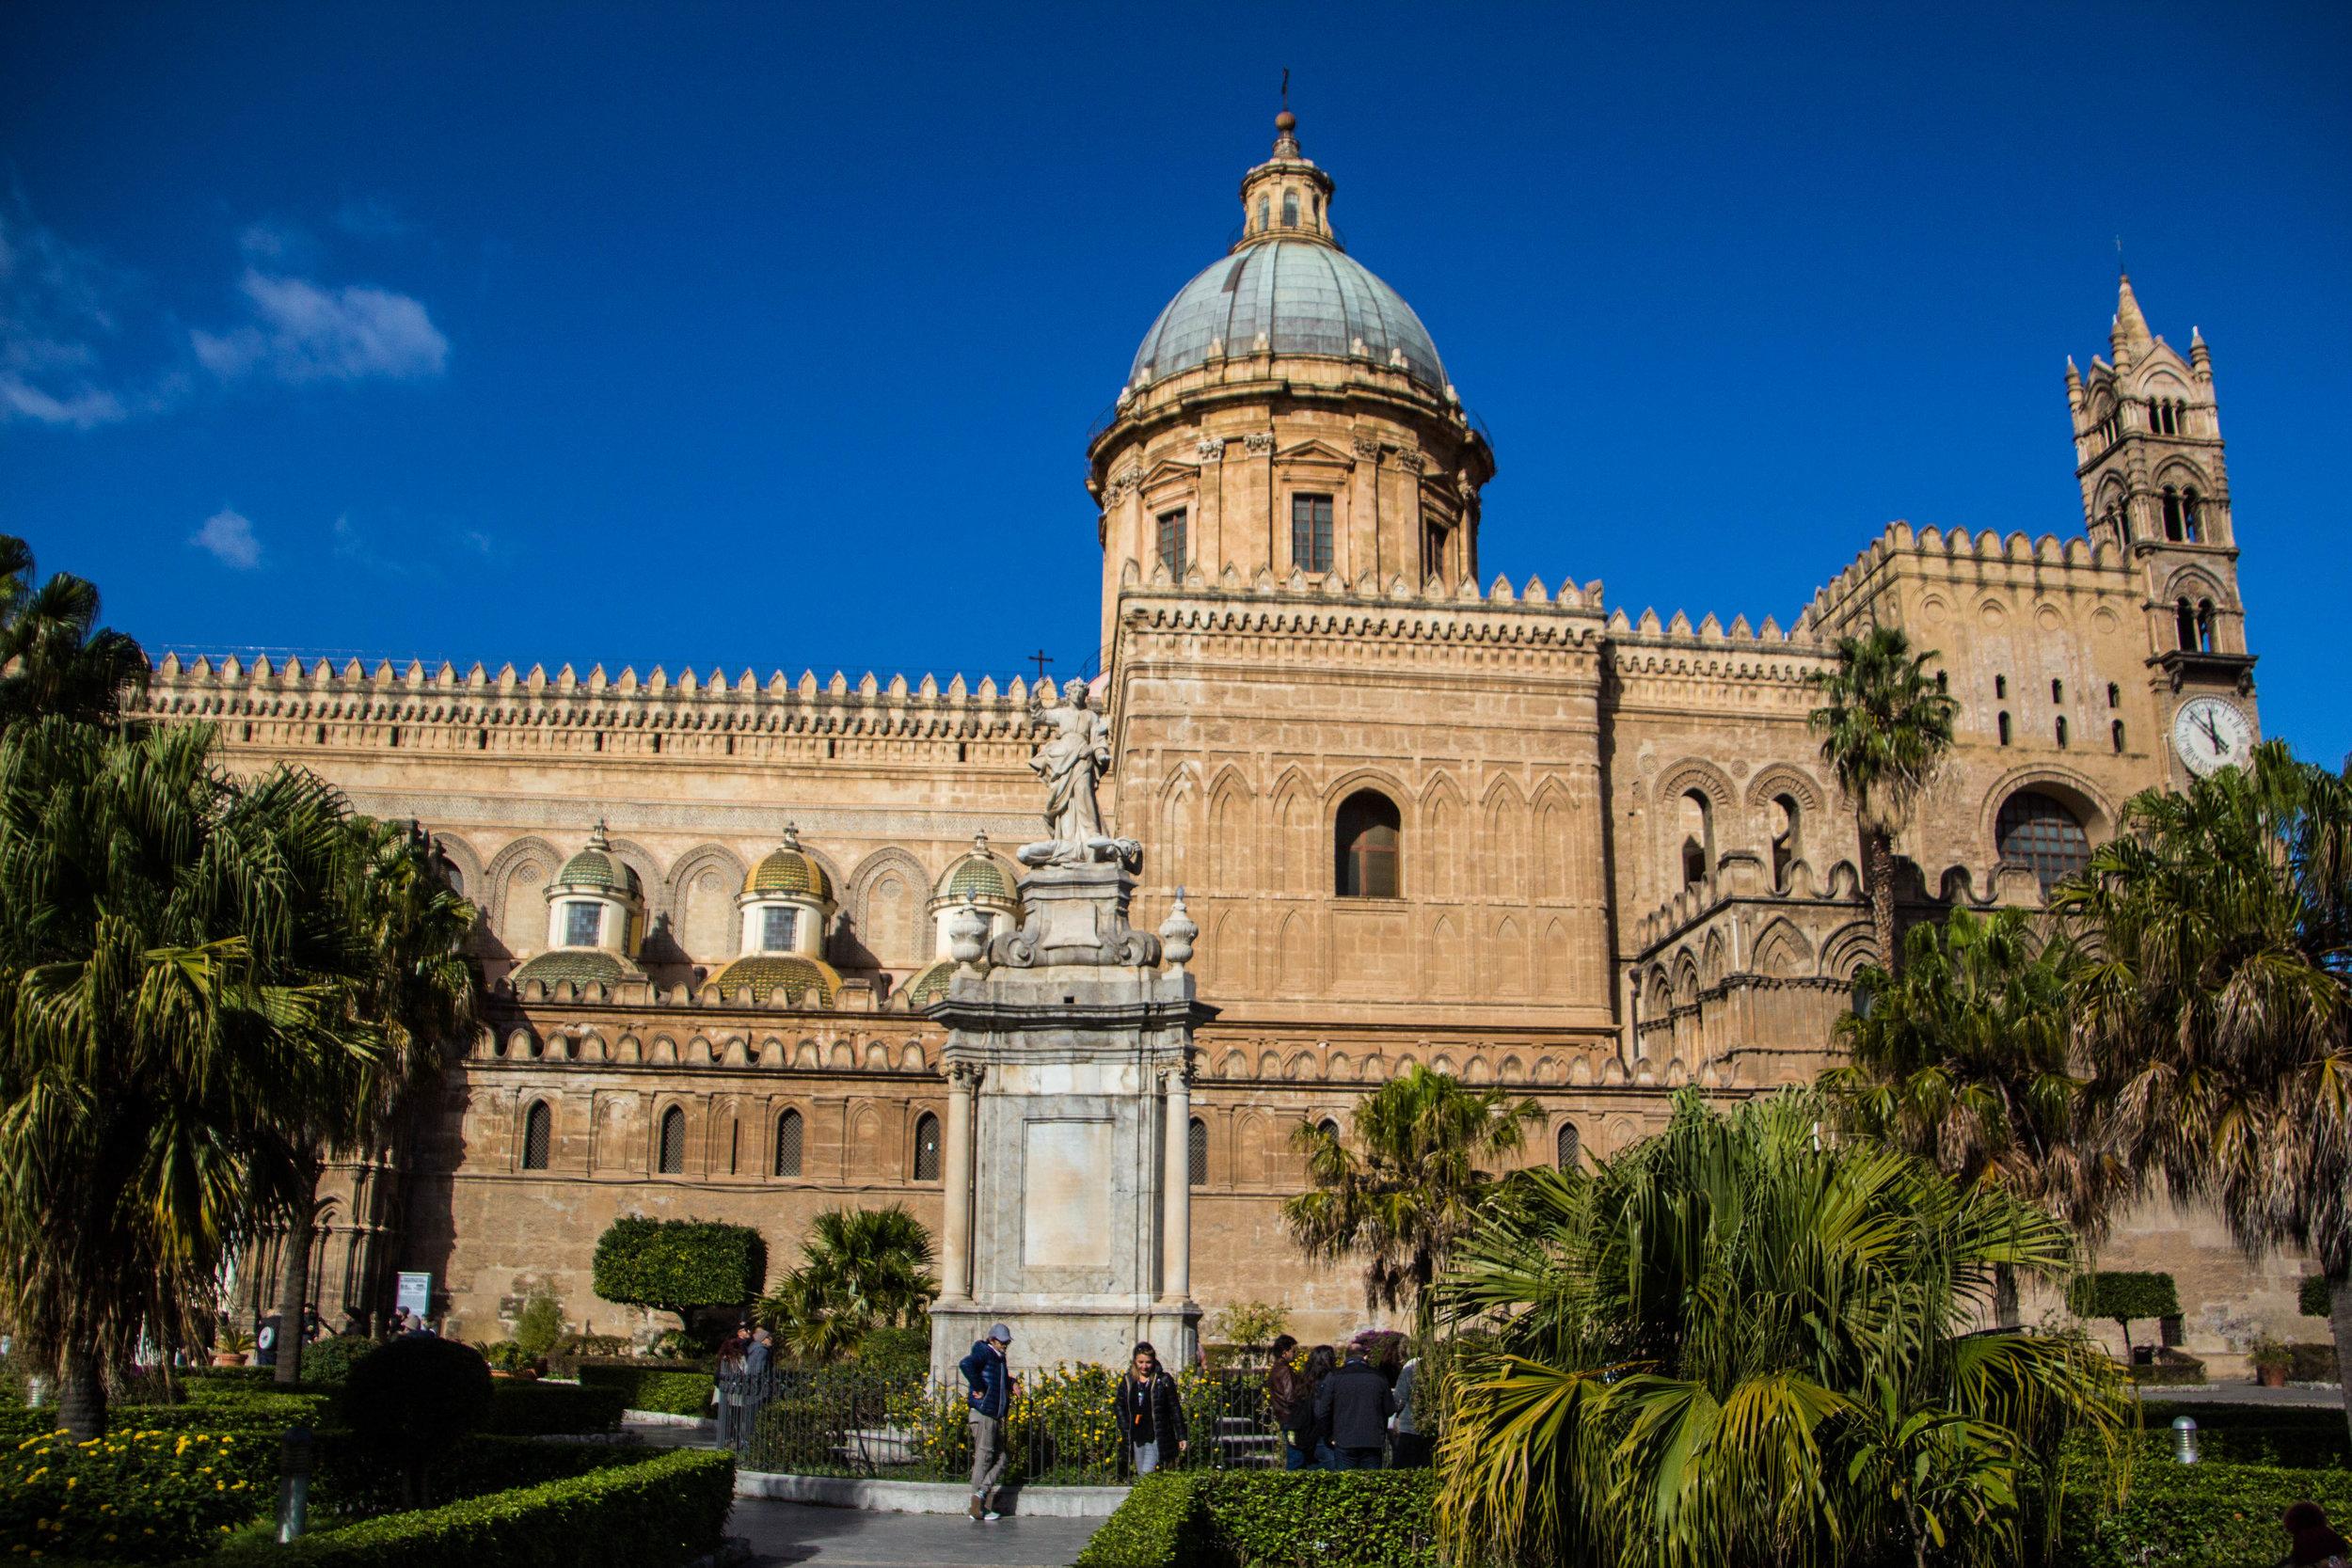 cattedrale-santa-vergine-maria-palermo-sicily -4.jpg